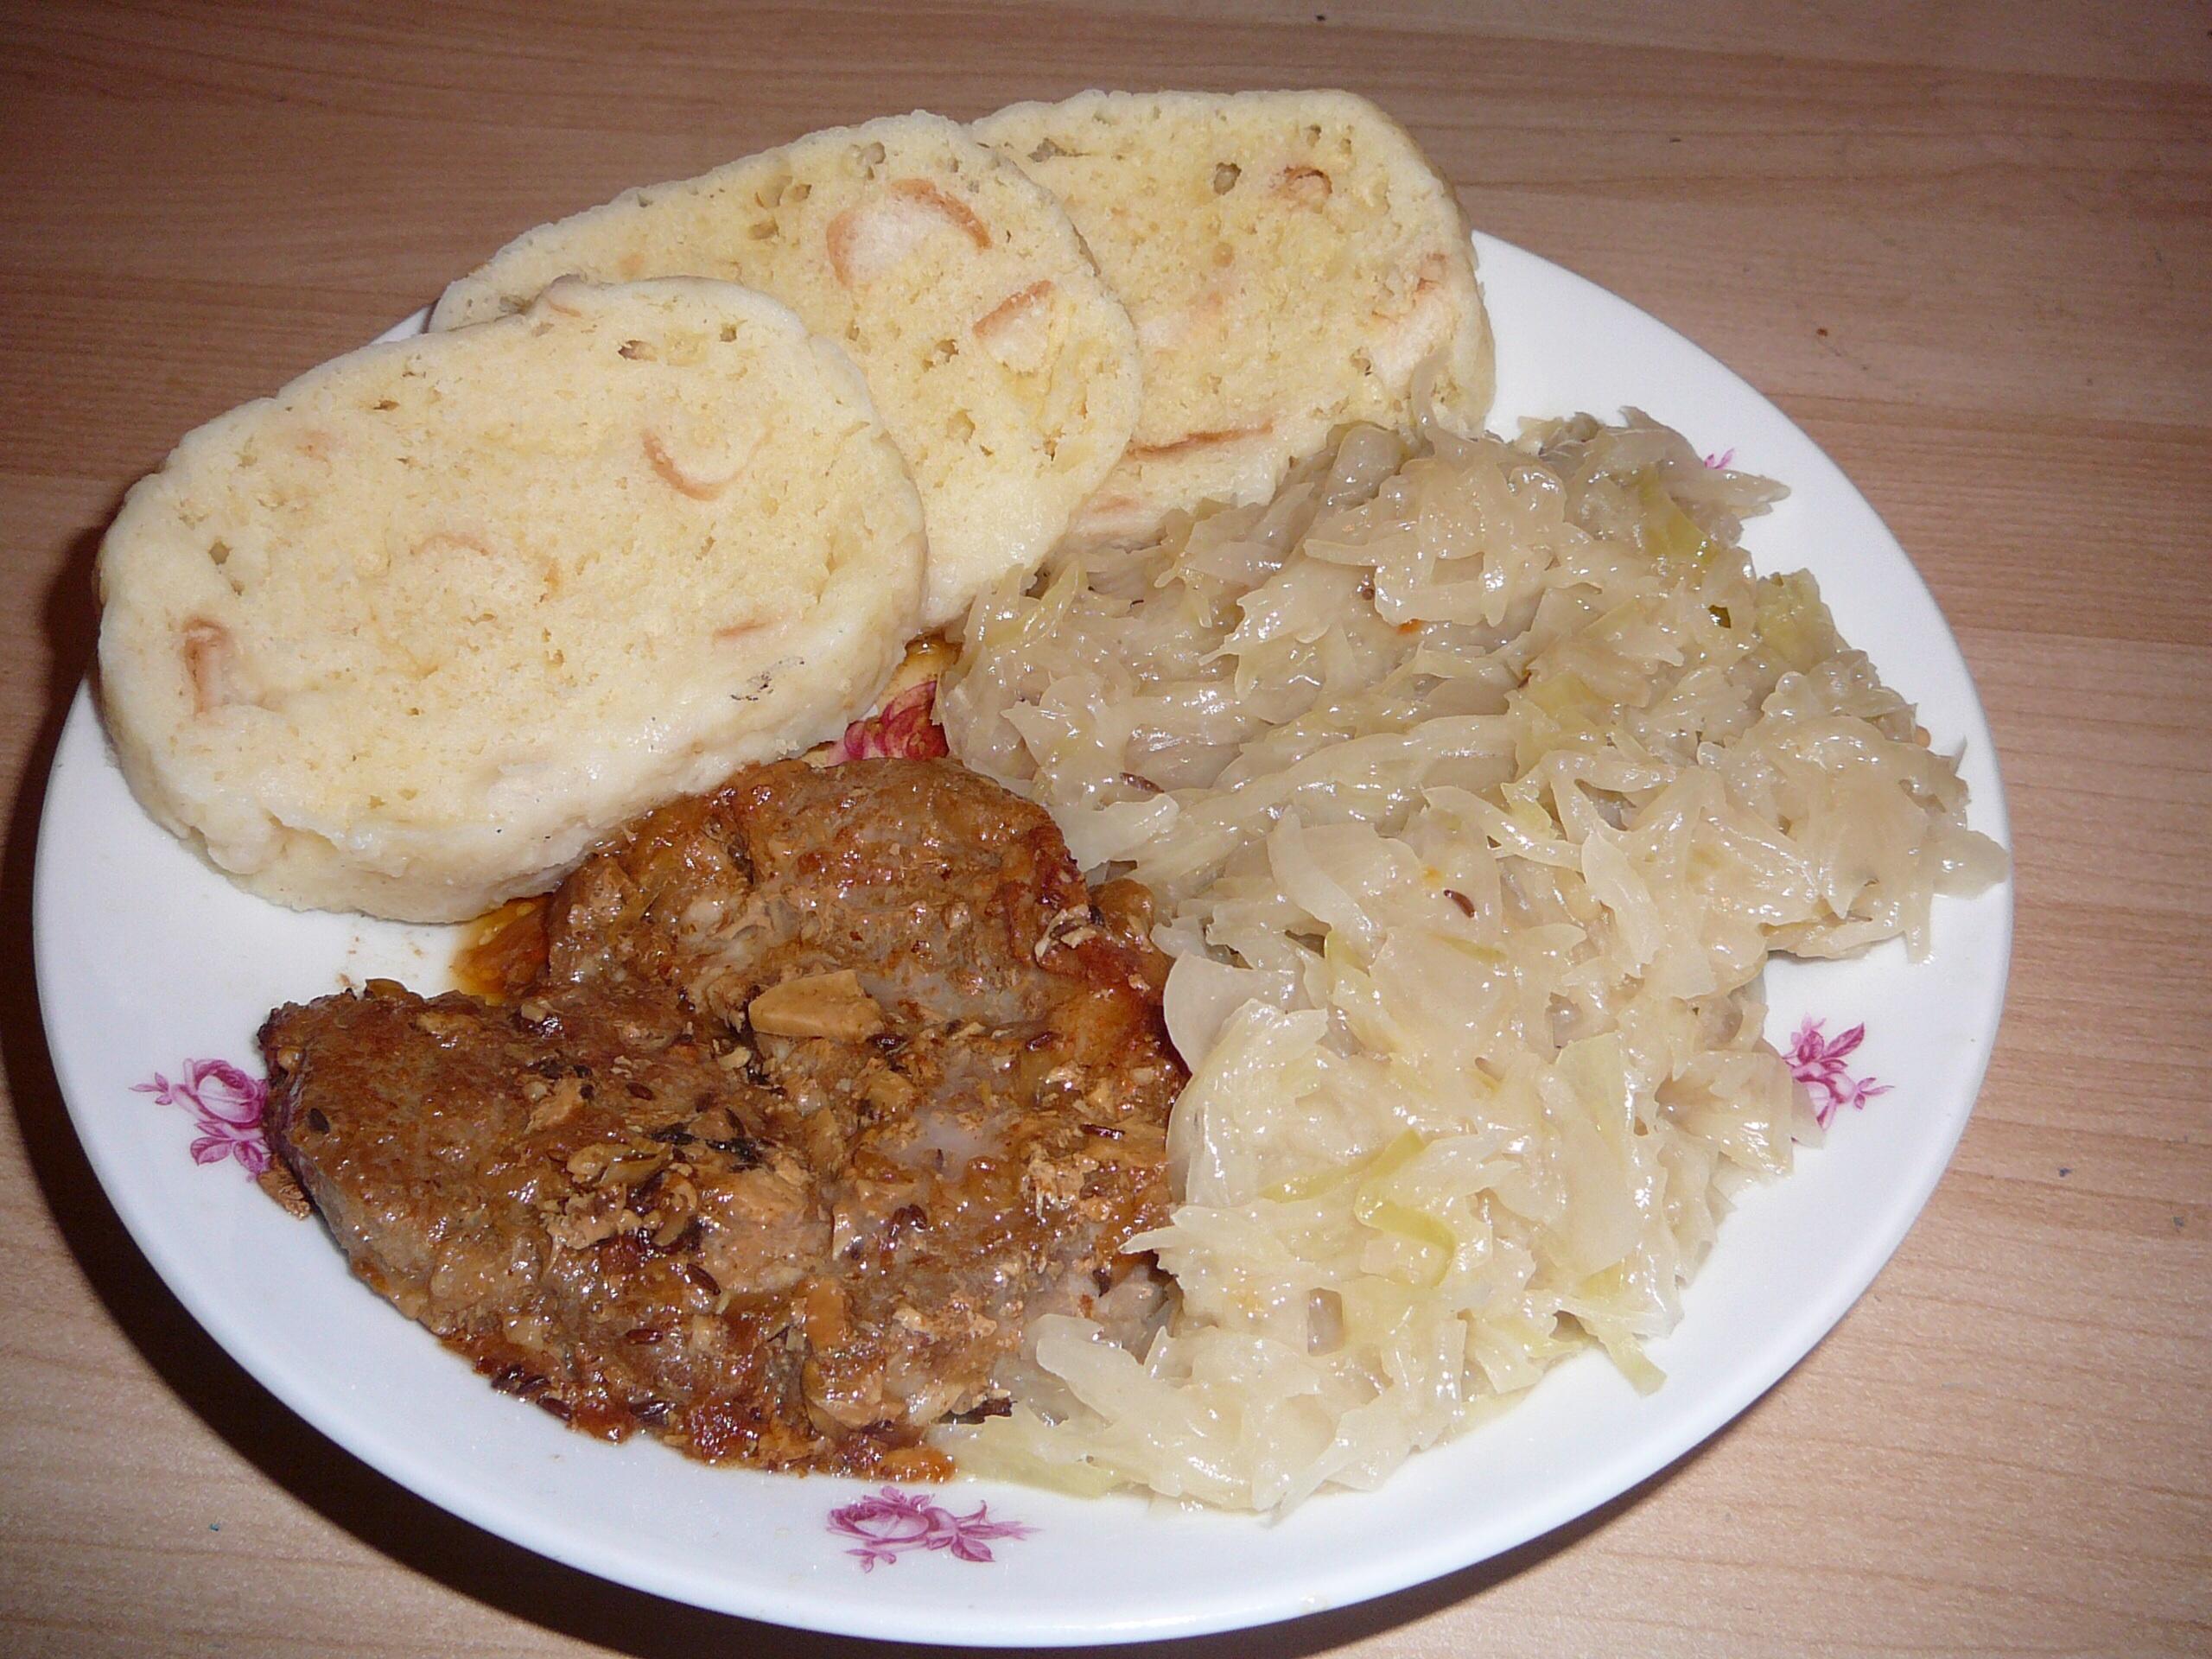 Best of czech republic food vepro knedlo zelo bonvoyageurs vepro knedlo zelo photo cspedia forumfinder Image collections